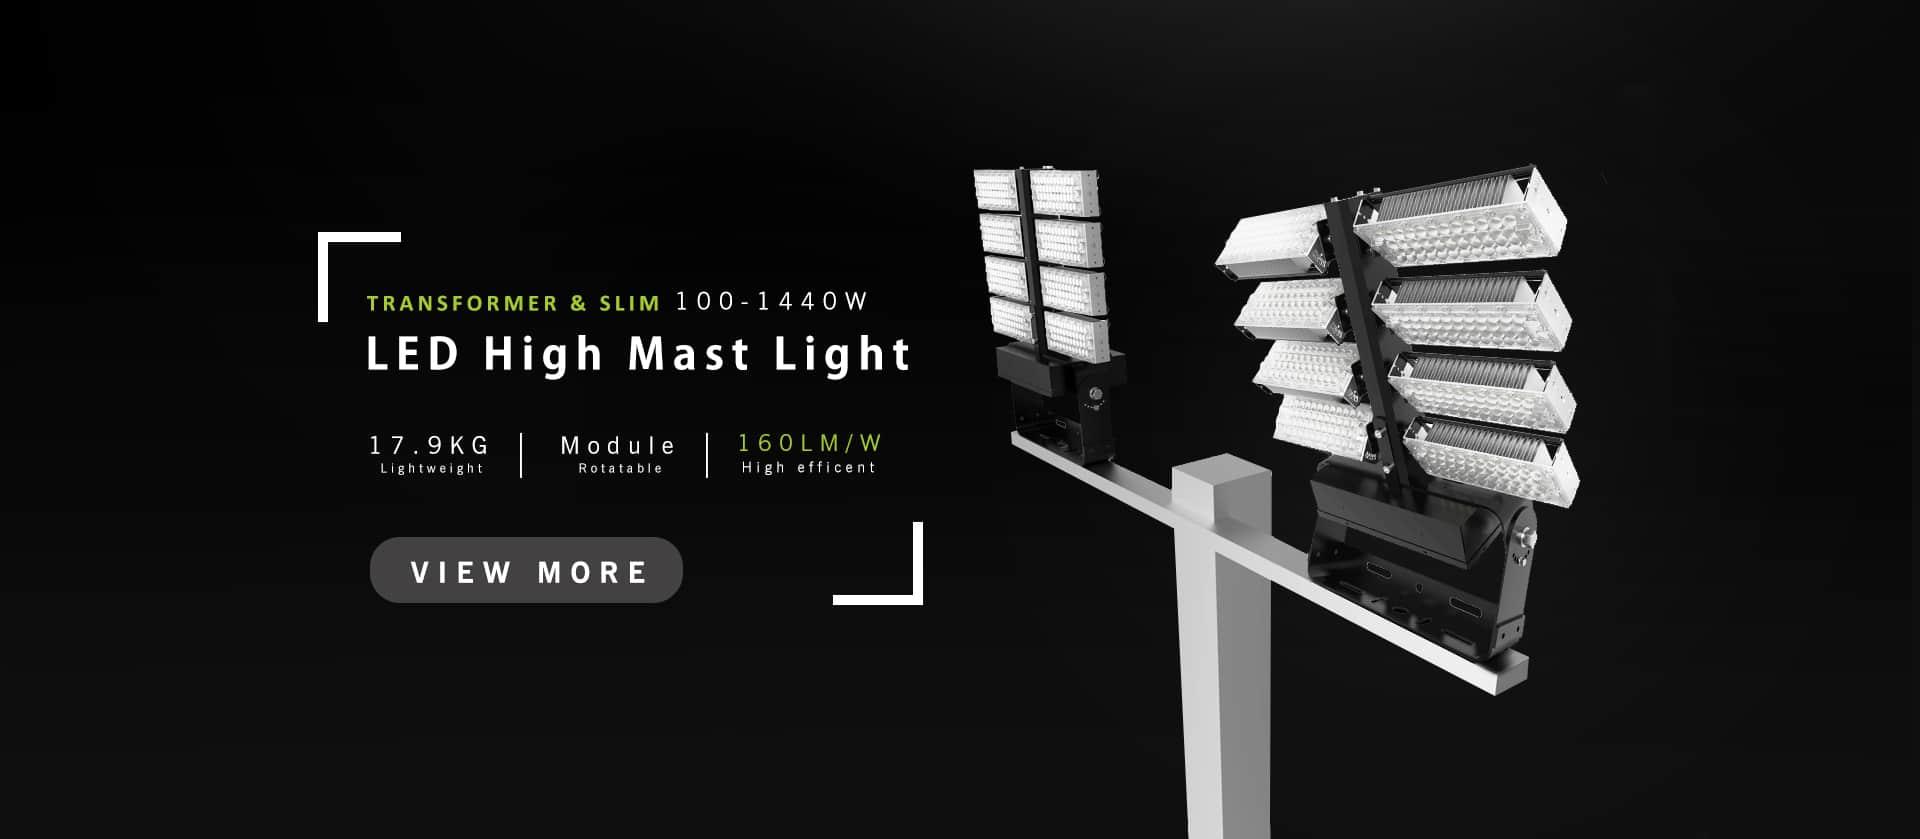 led high mast light 100w to 1440w